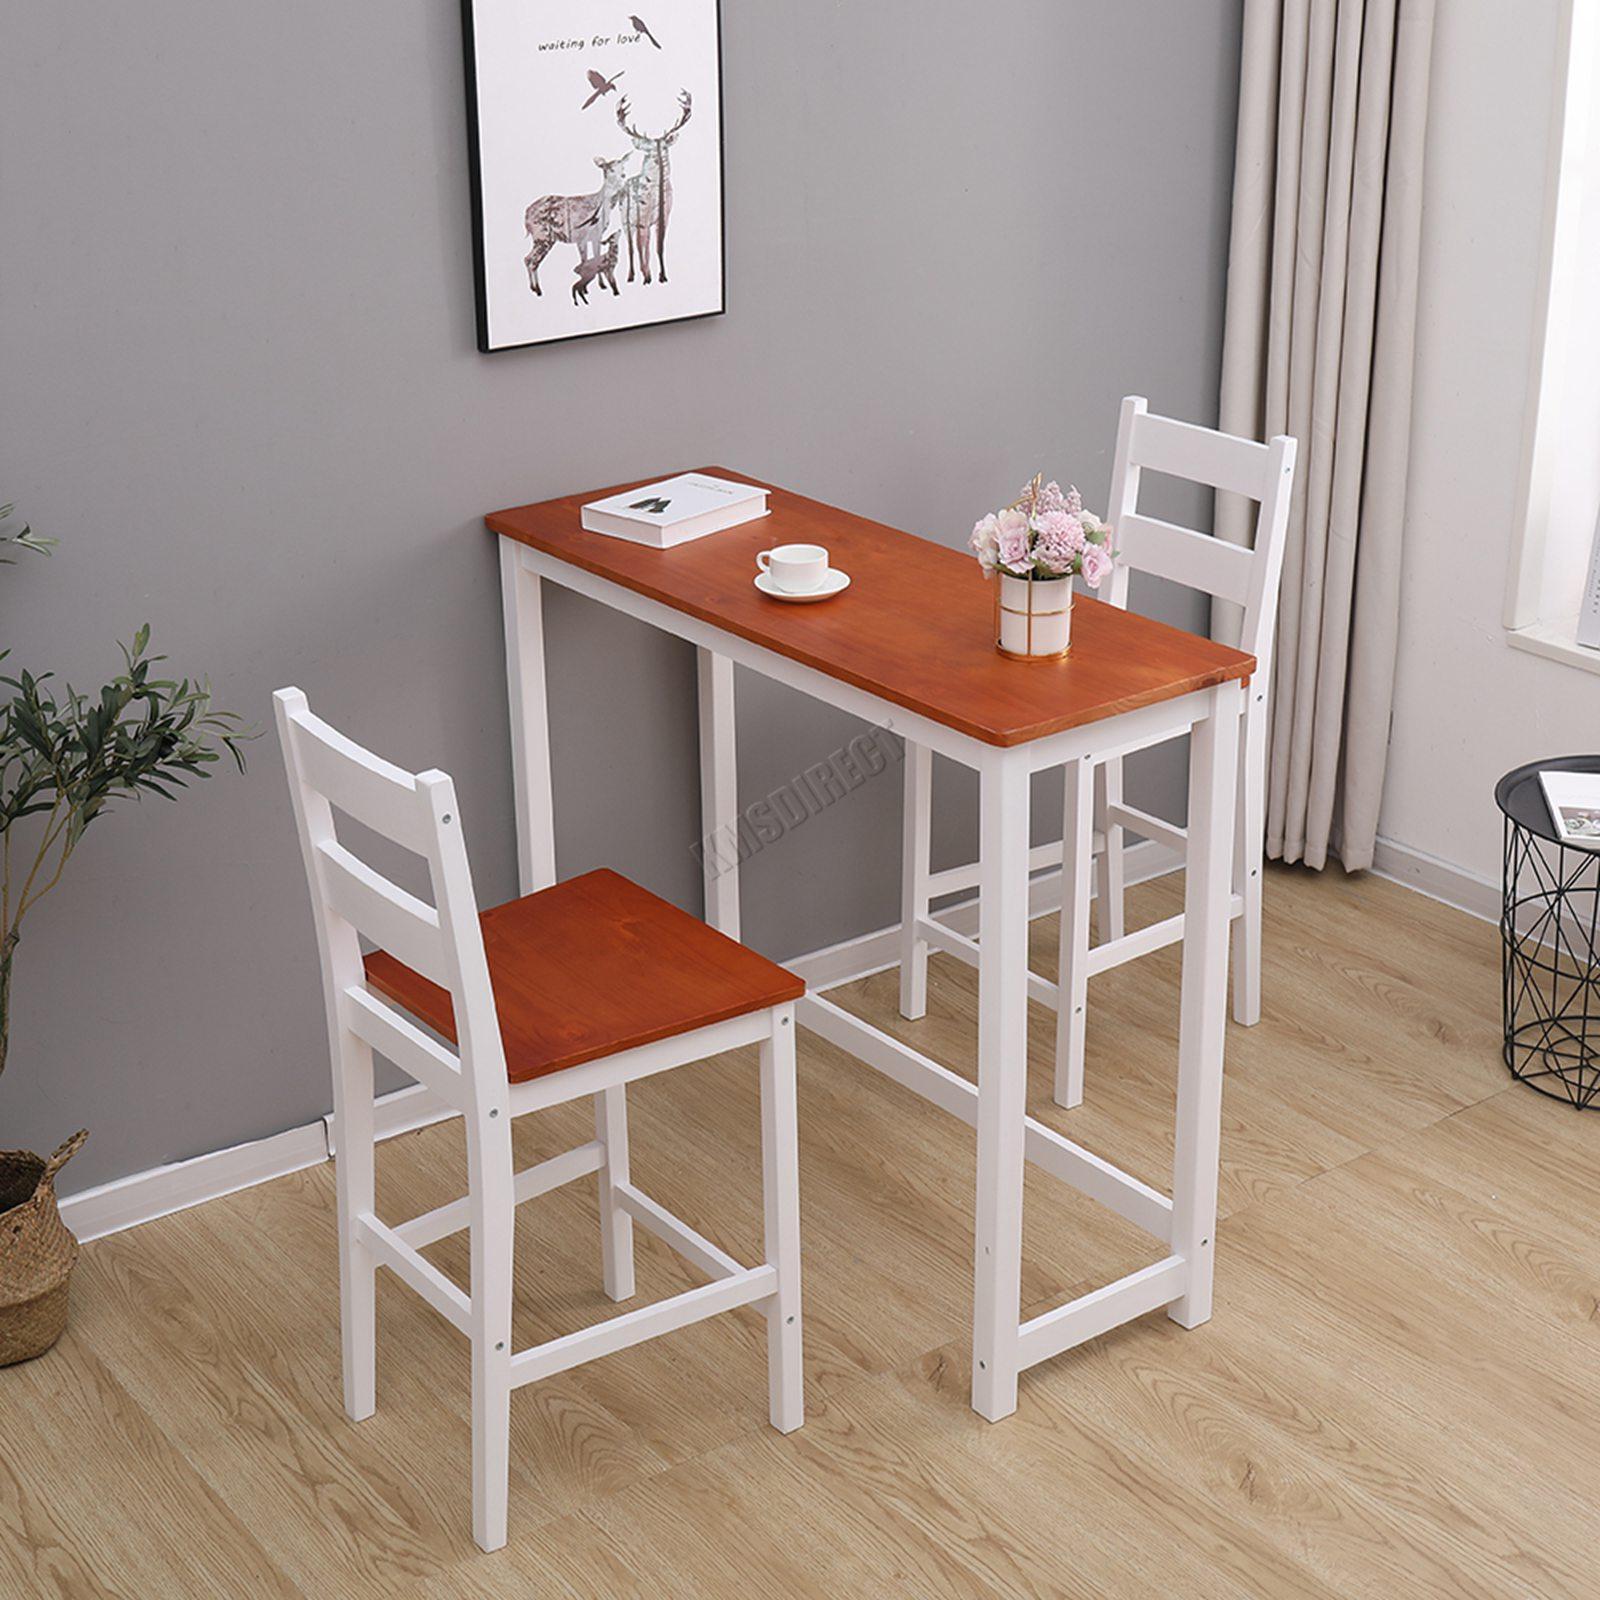 westwood breakfast bar table 2 x stools set solid pine